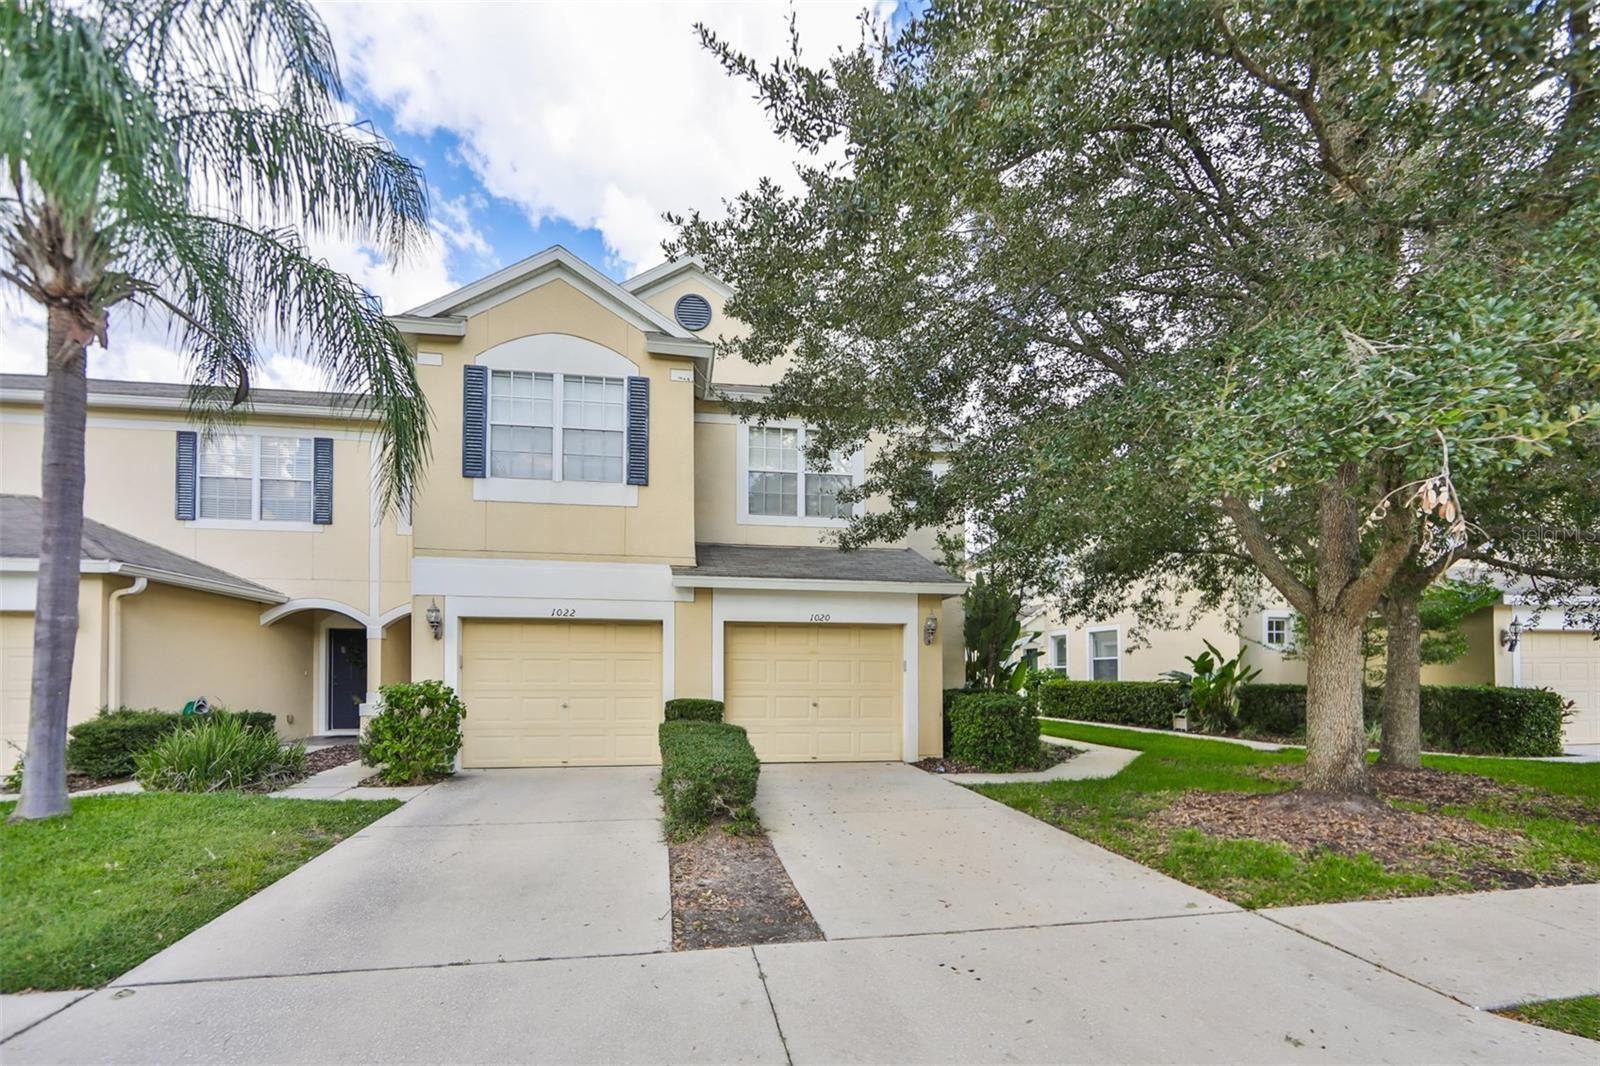 1020 VISTA CAY COURT, Brandon, FL 33511 - MLS#: T3336866